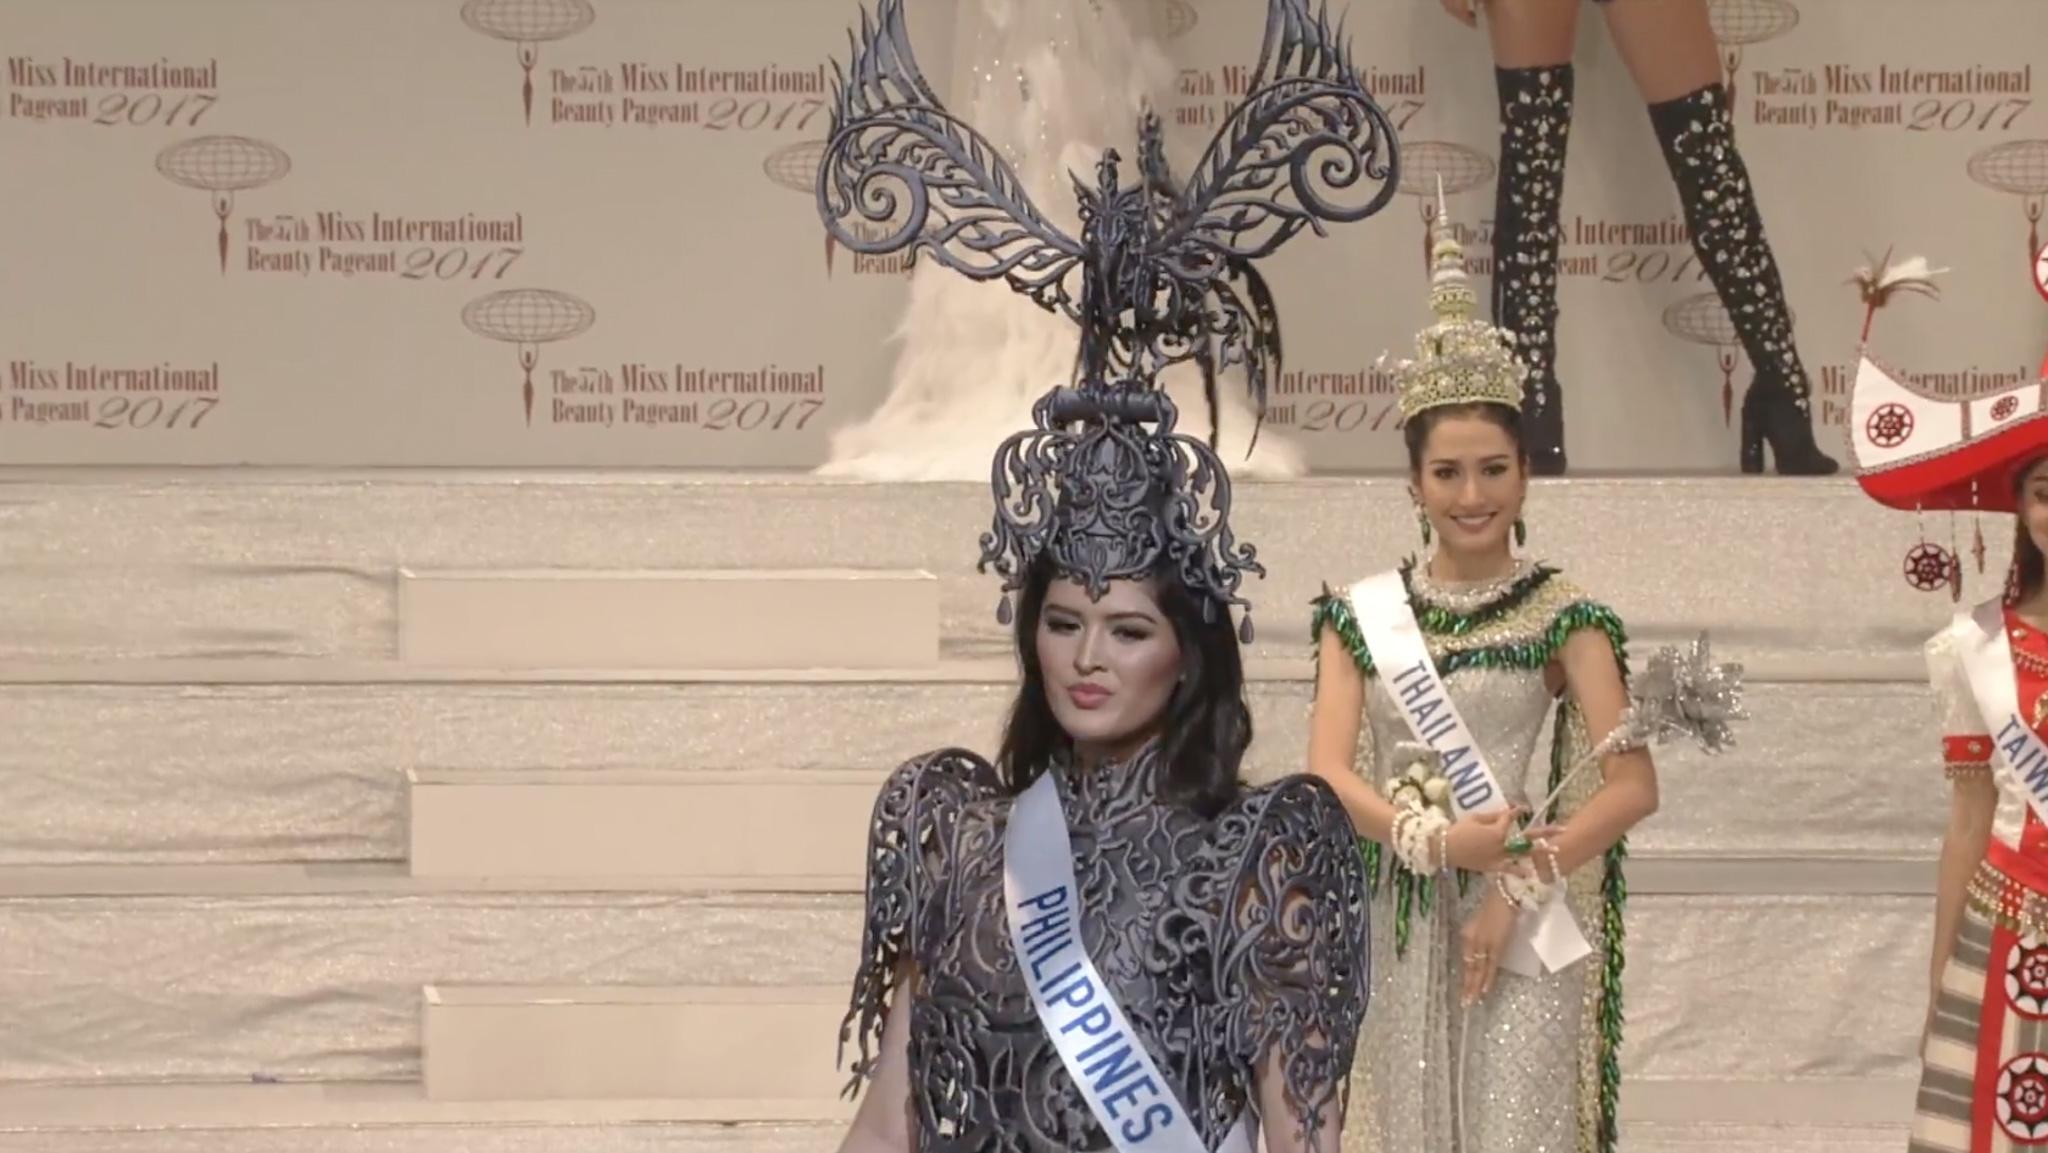 Screengrab from Miss International